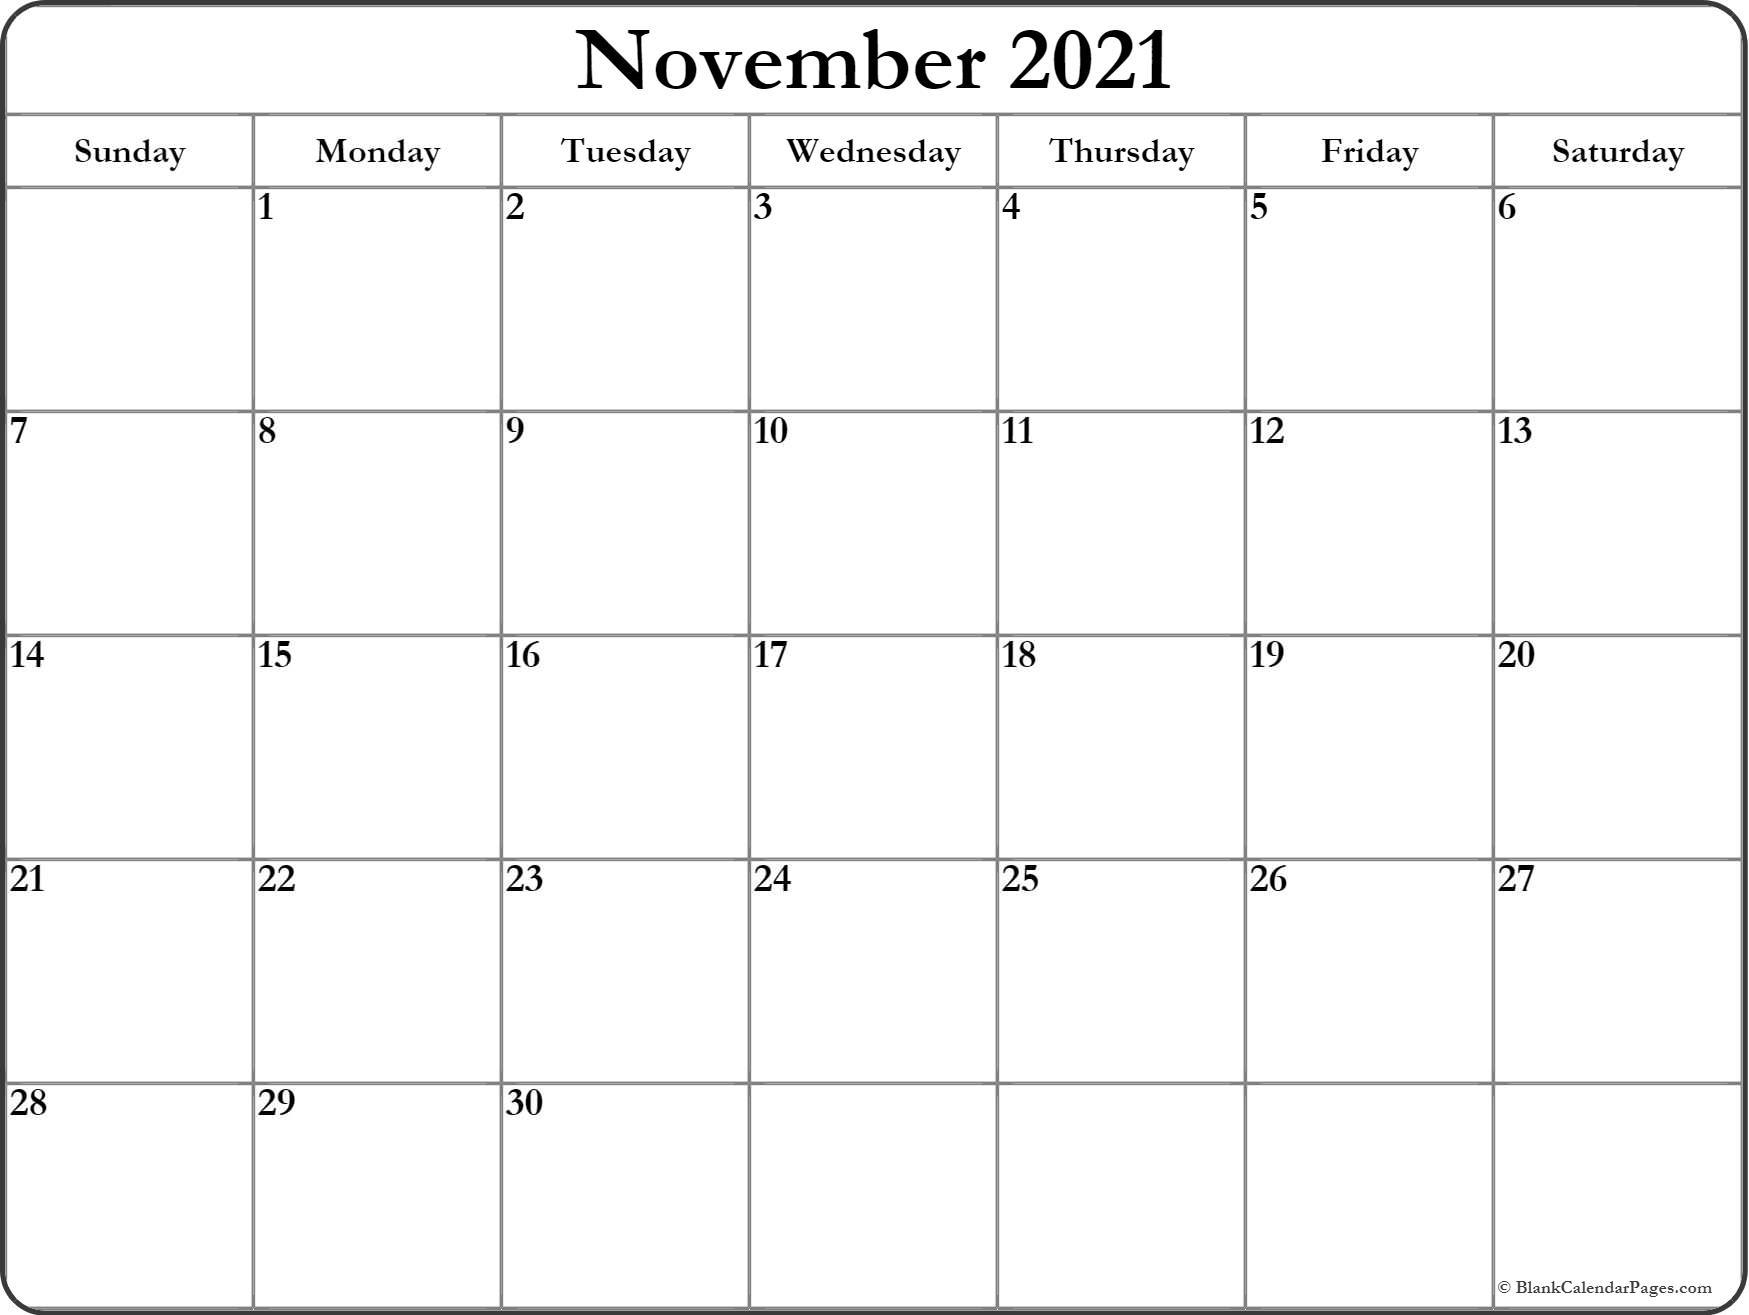 November 2021 Calendar   Free Printable Monthly Calendars regarding Calendar 2021 November Fill In